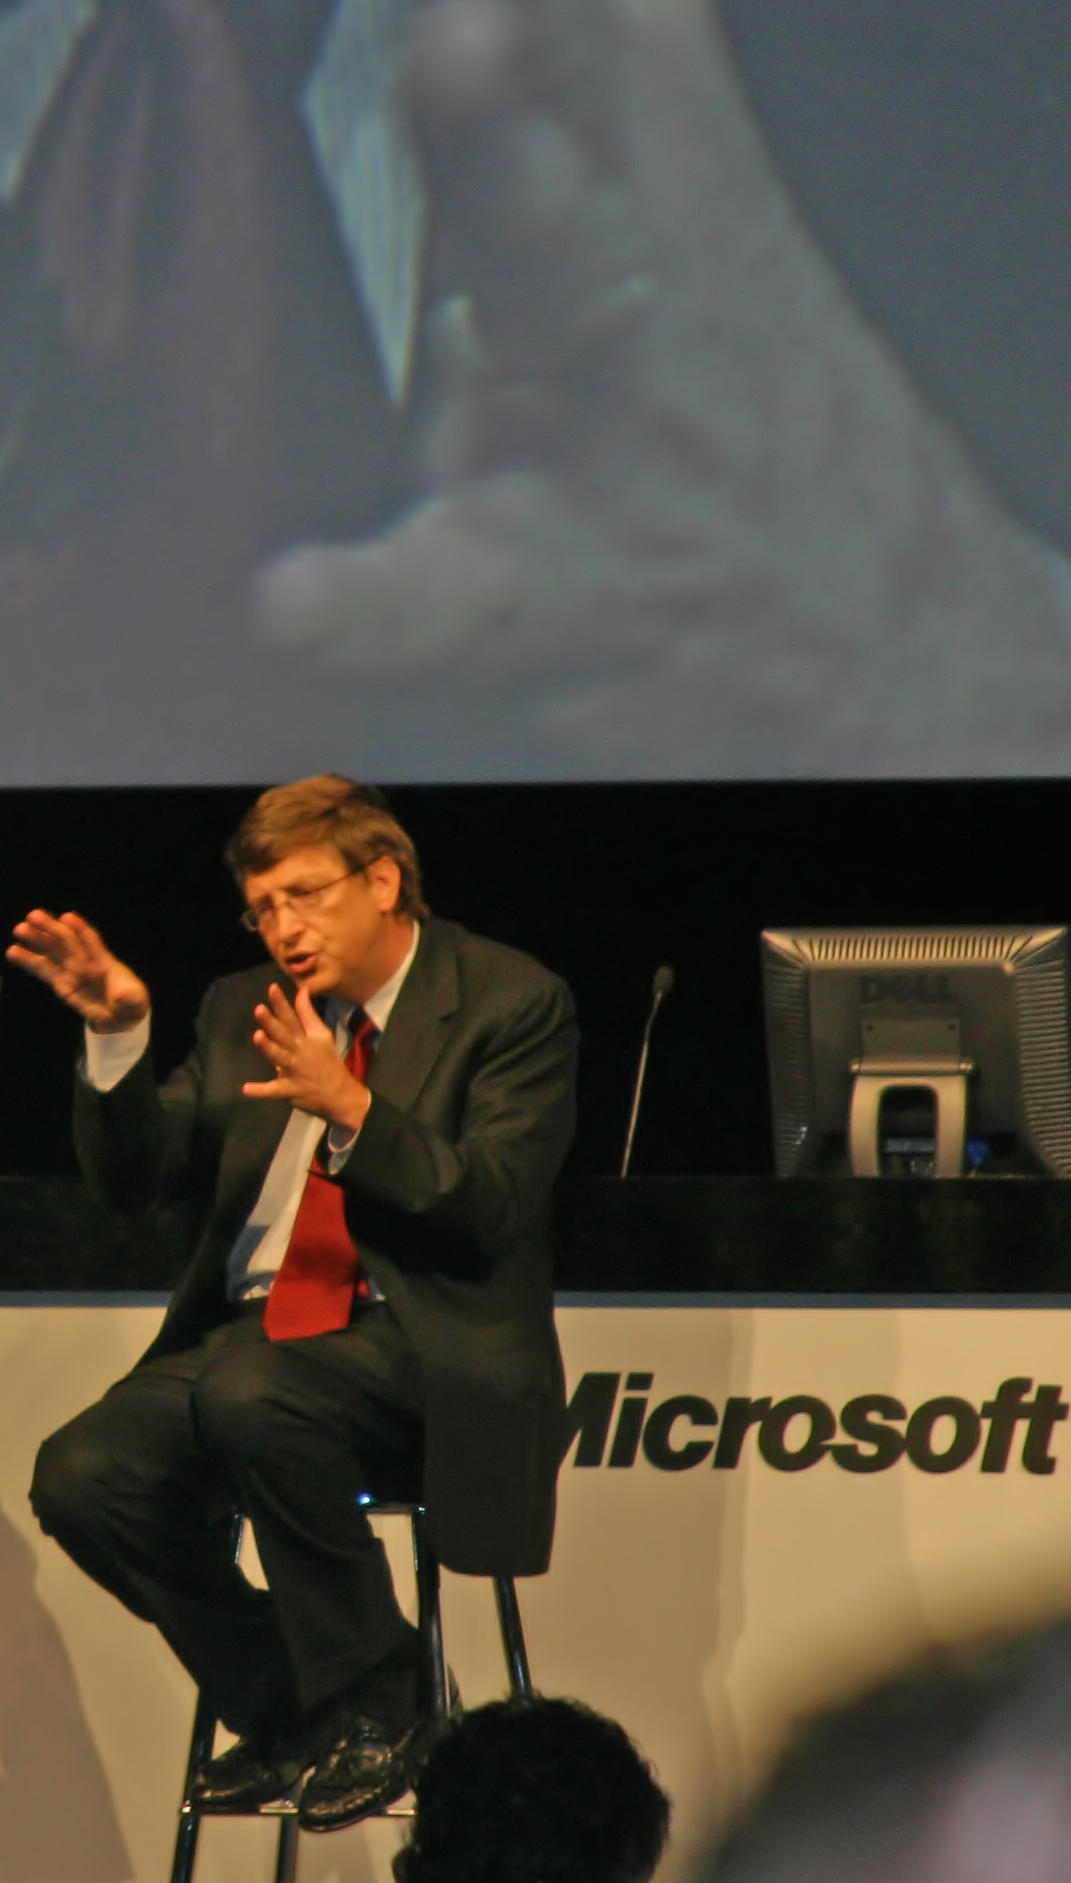 microsoft_Bill_Gates_kopenhagen_2004